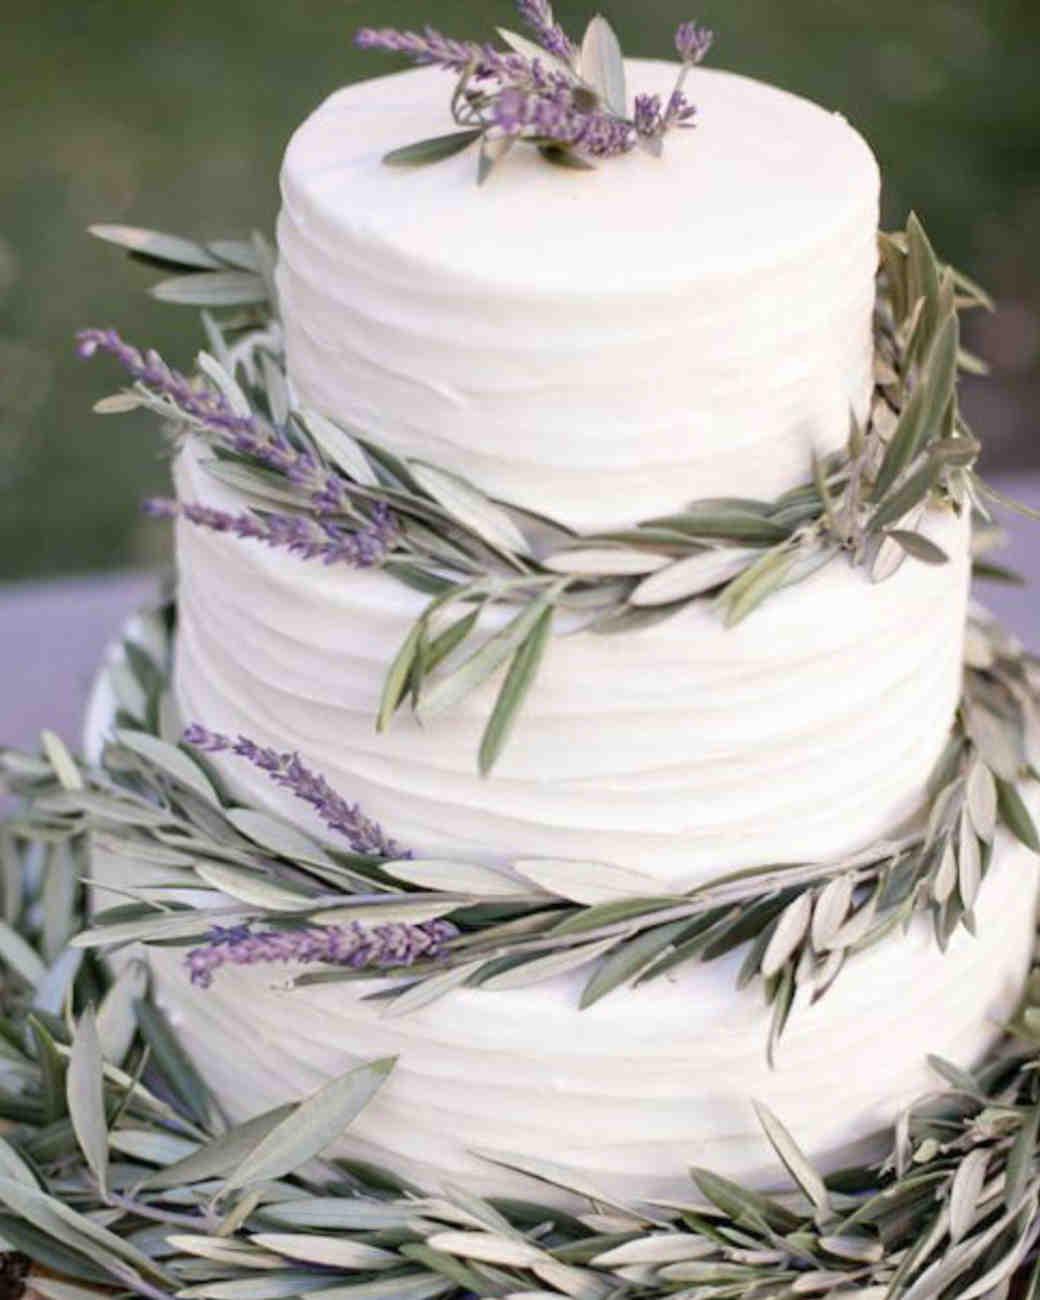 Vegan Wedding Cake Recipe  7 Delicious Vegan Wedding Cakes